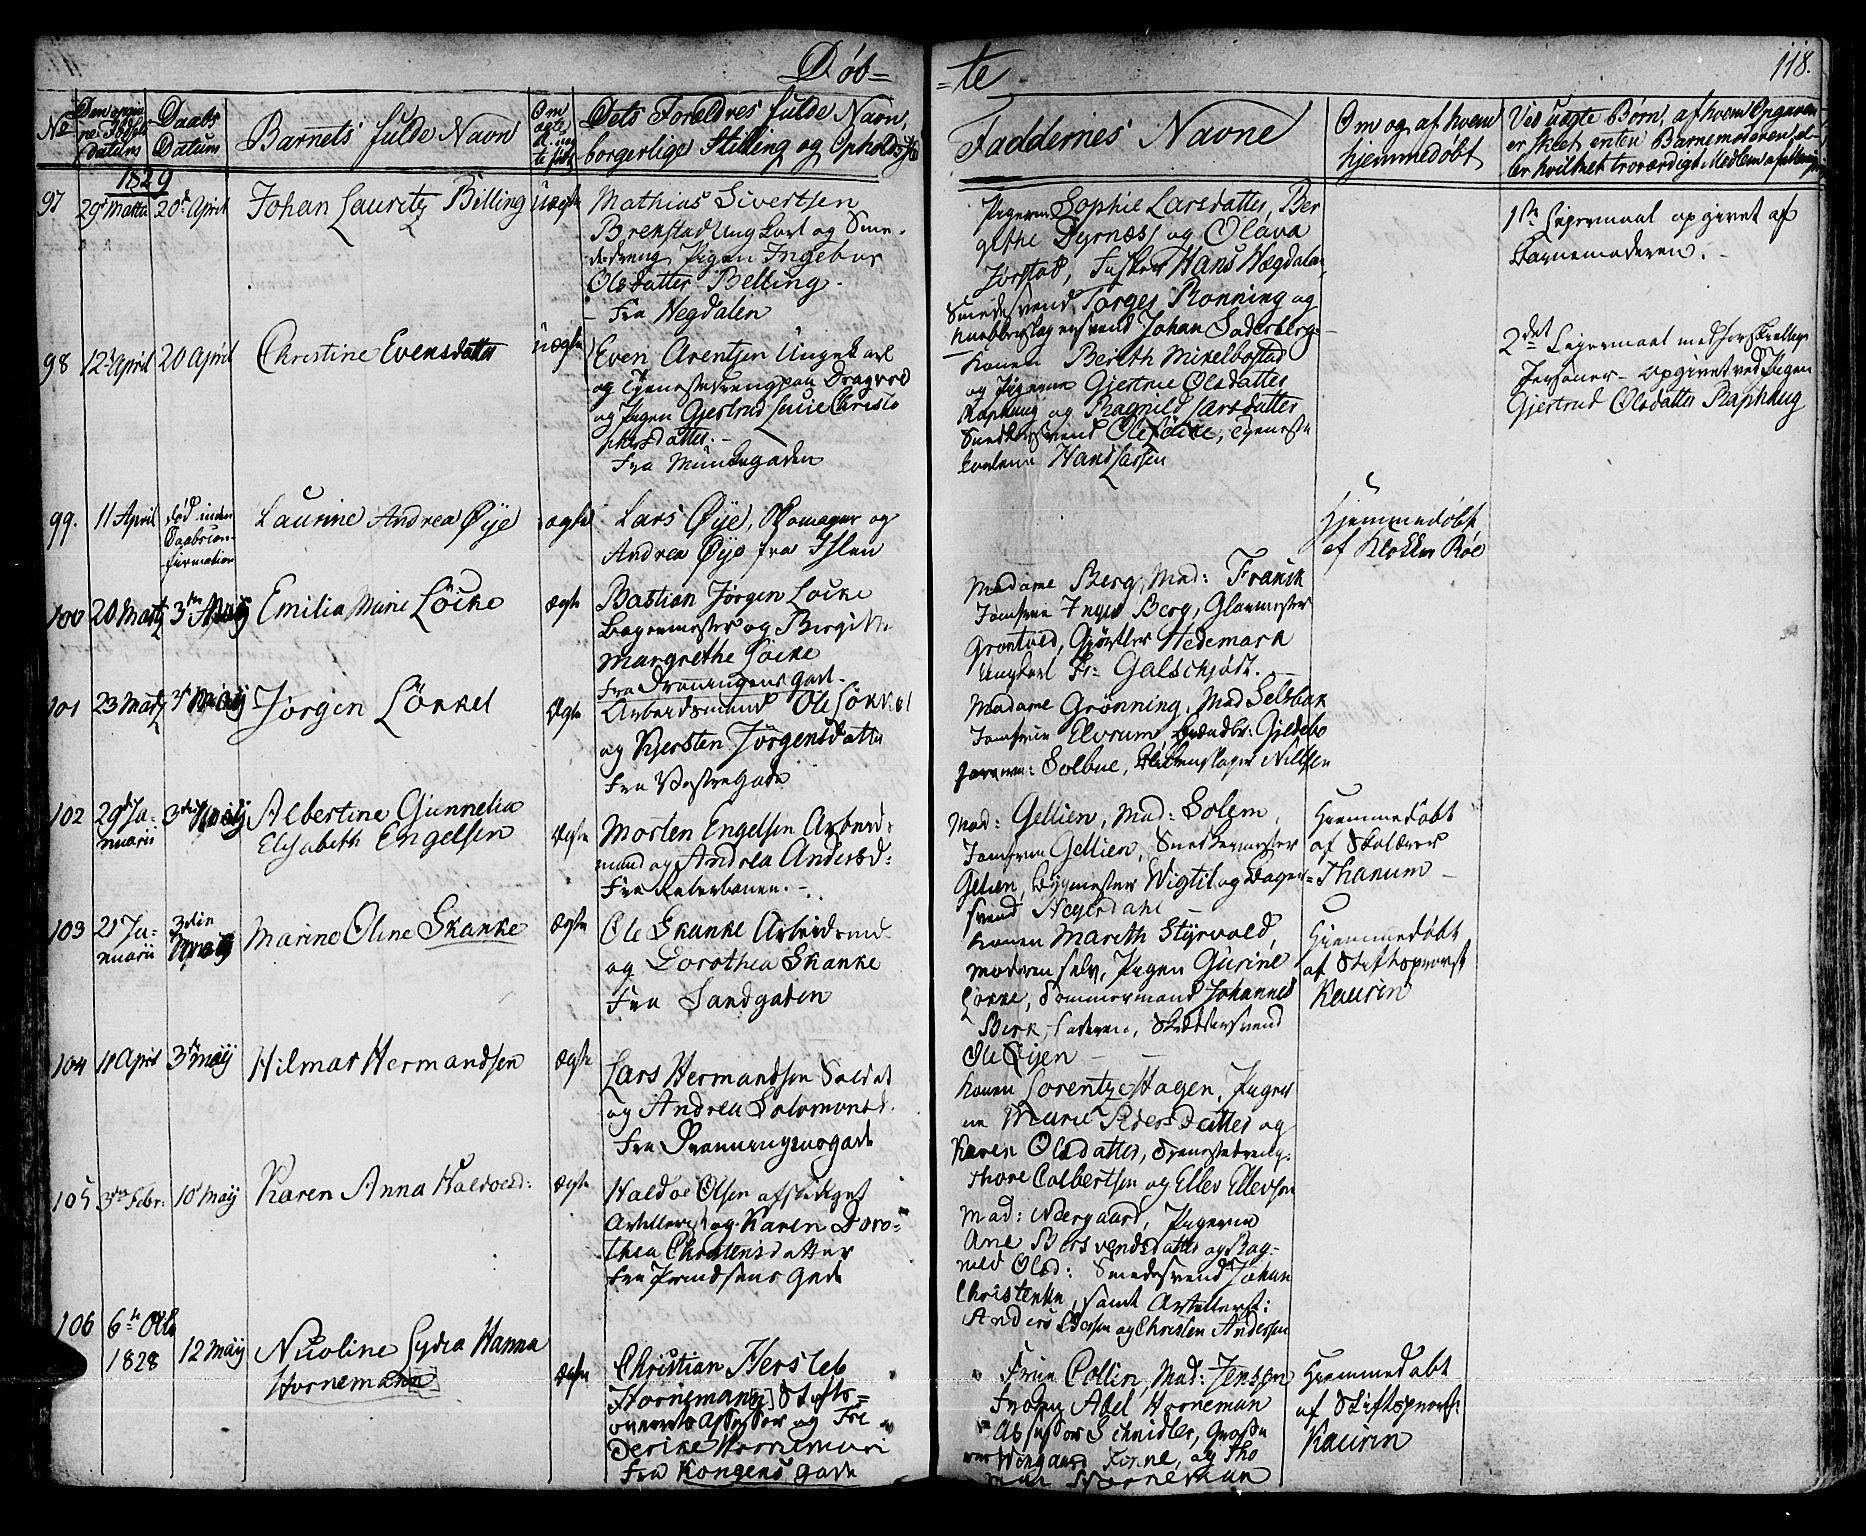 SAT, Ministerialprotokoller, klokkerbøker og fødselsregistre - Sør-Trøndelag, 601/L0045: Parish register (official) no. 601A13, 1821-1831, p. 118